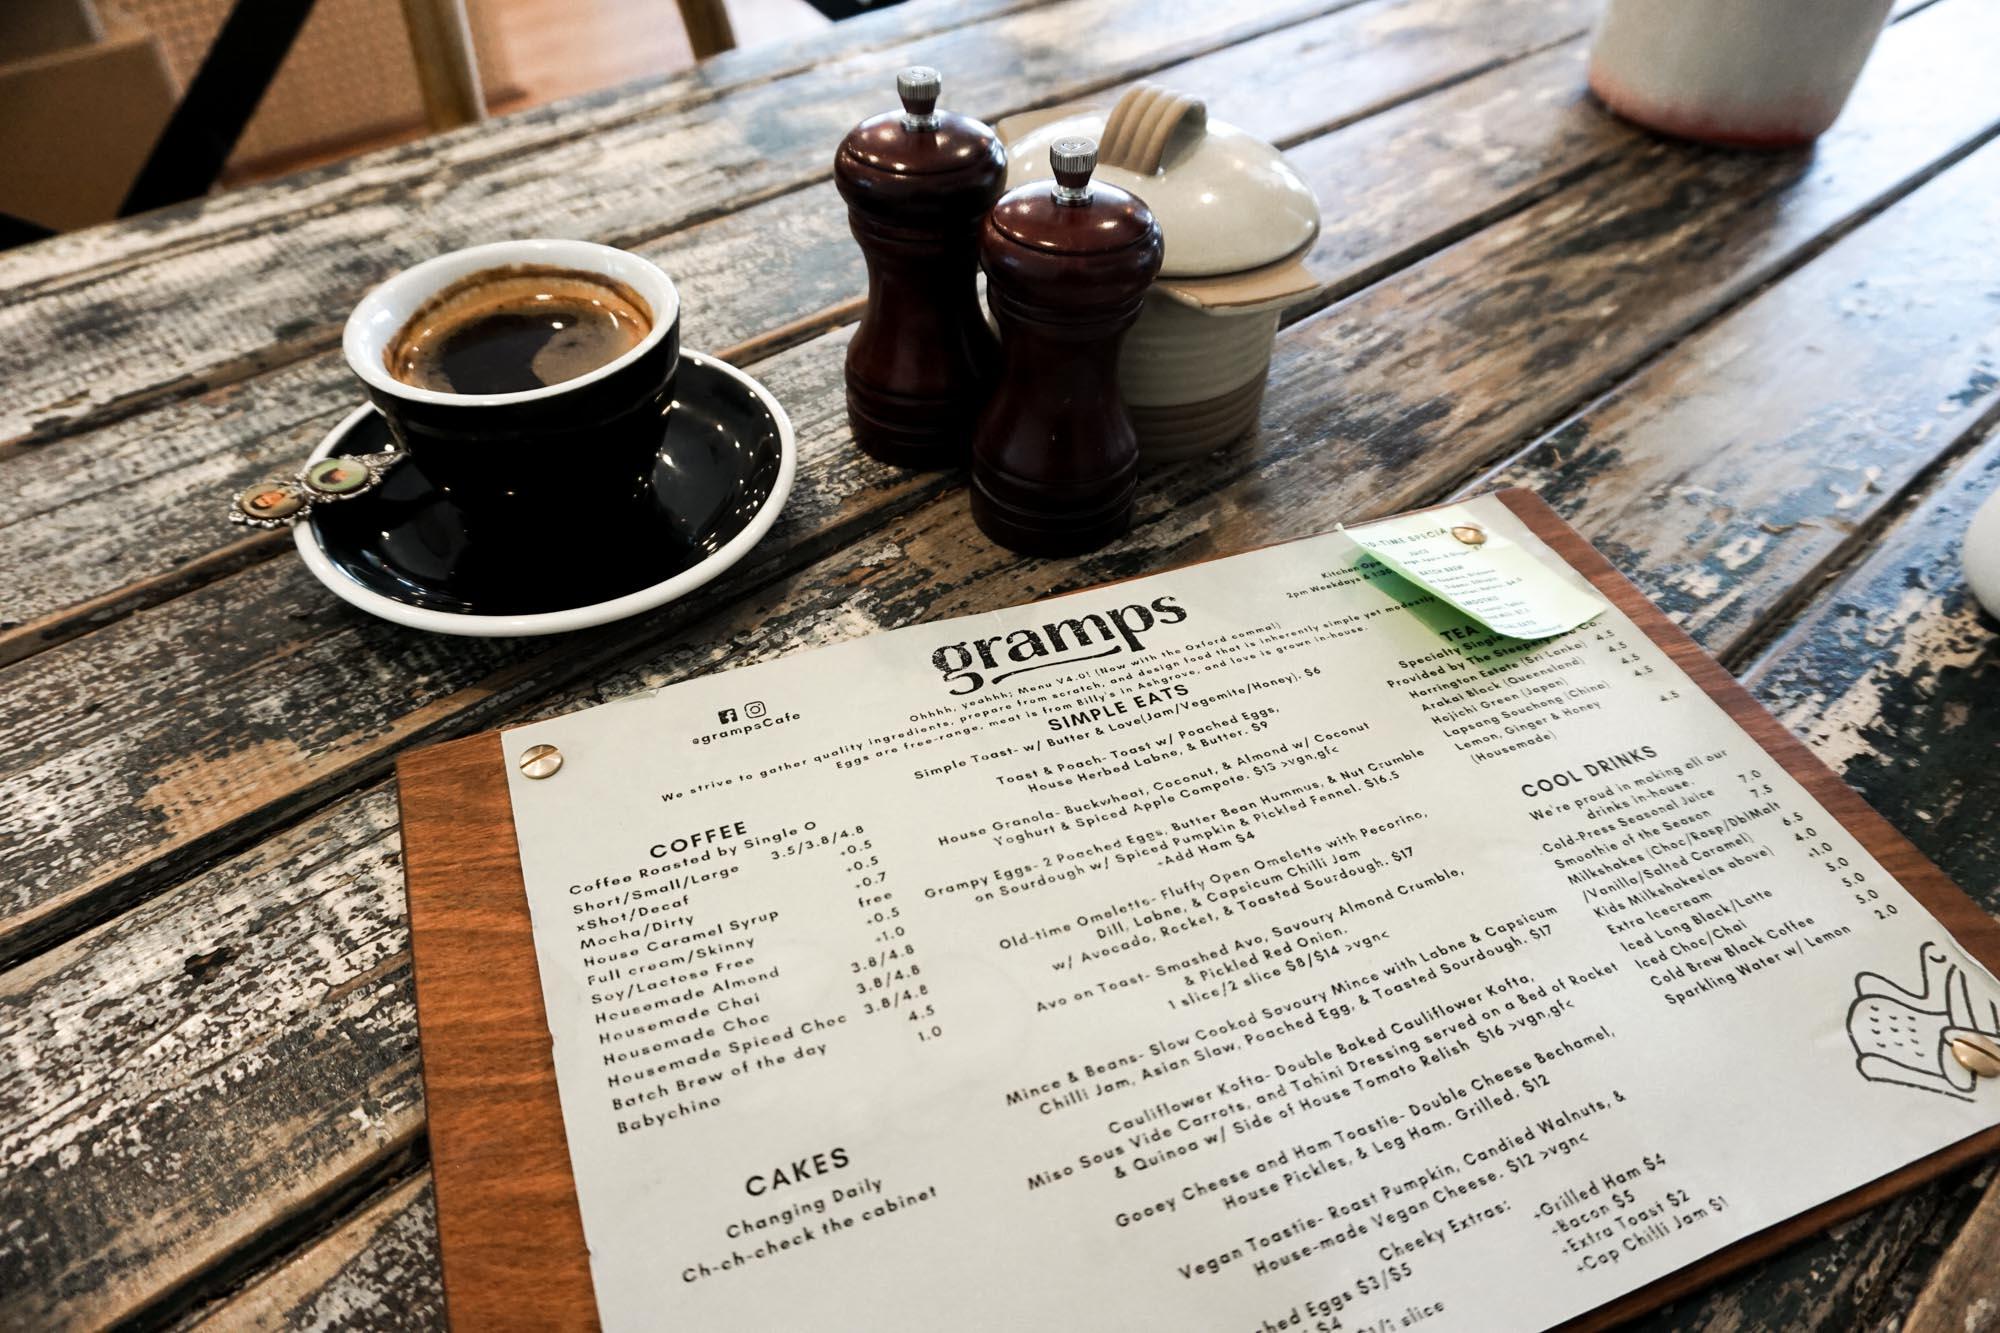 Gramps-Cafe-Indulge-Magazine-2-of-9.jpg